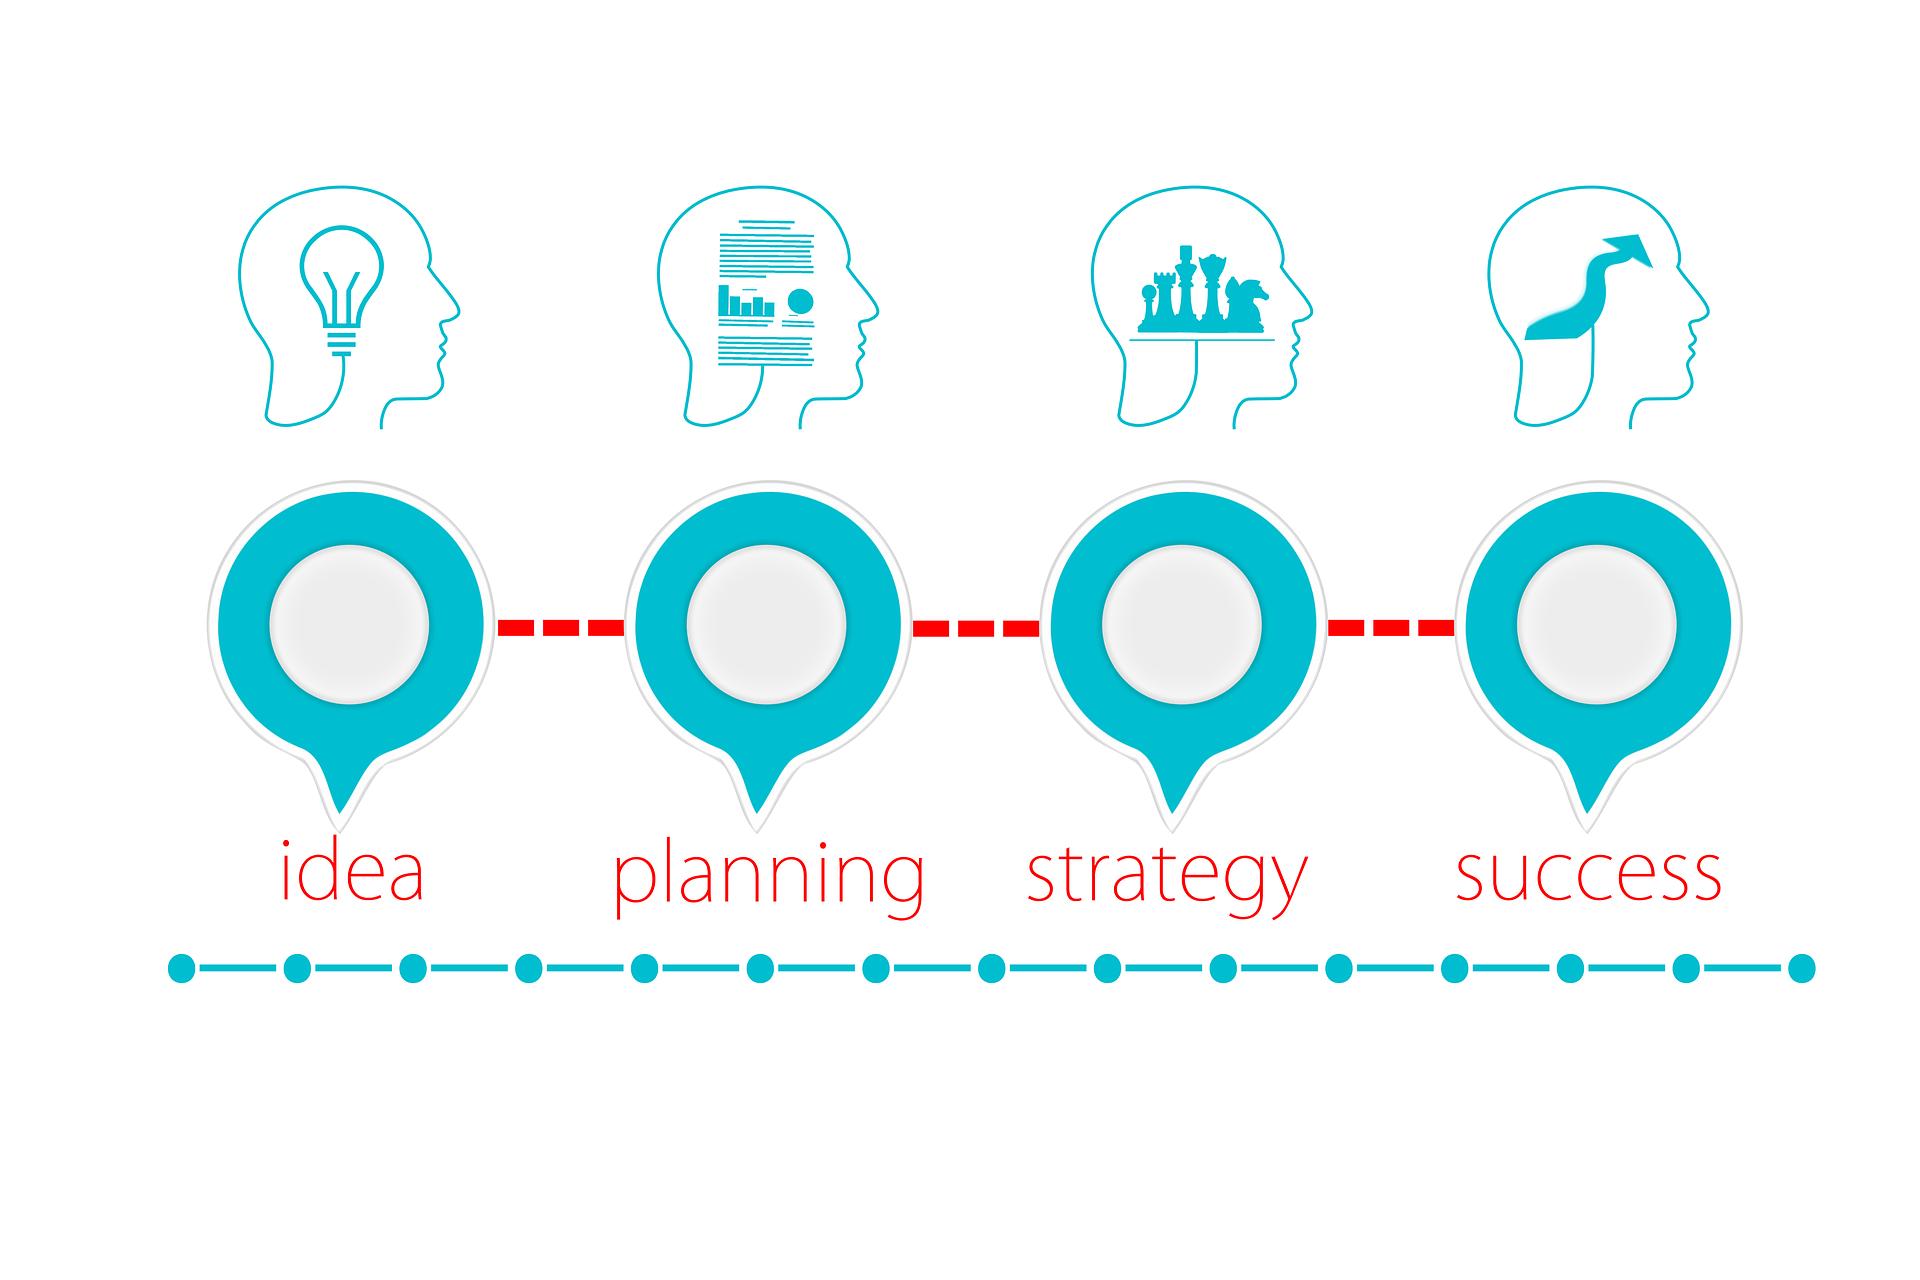 kundenbedarf ermitteln, kundenbedarf, starbucks marketing